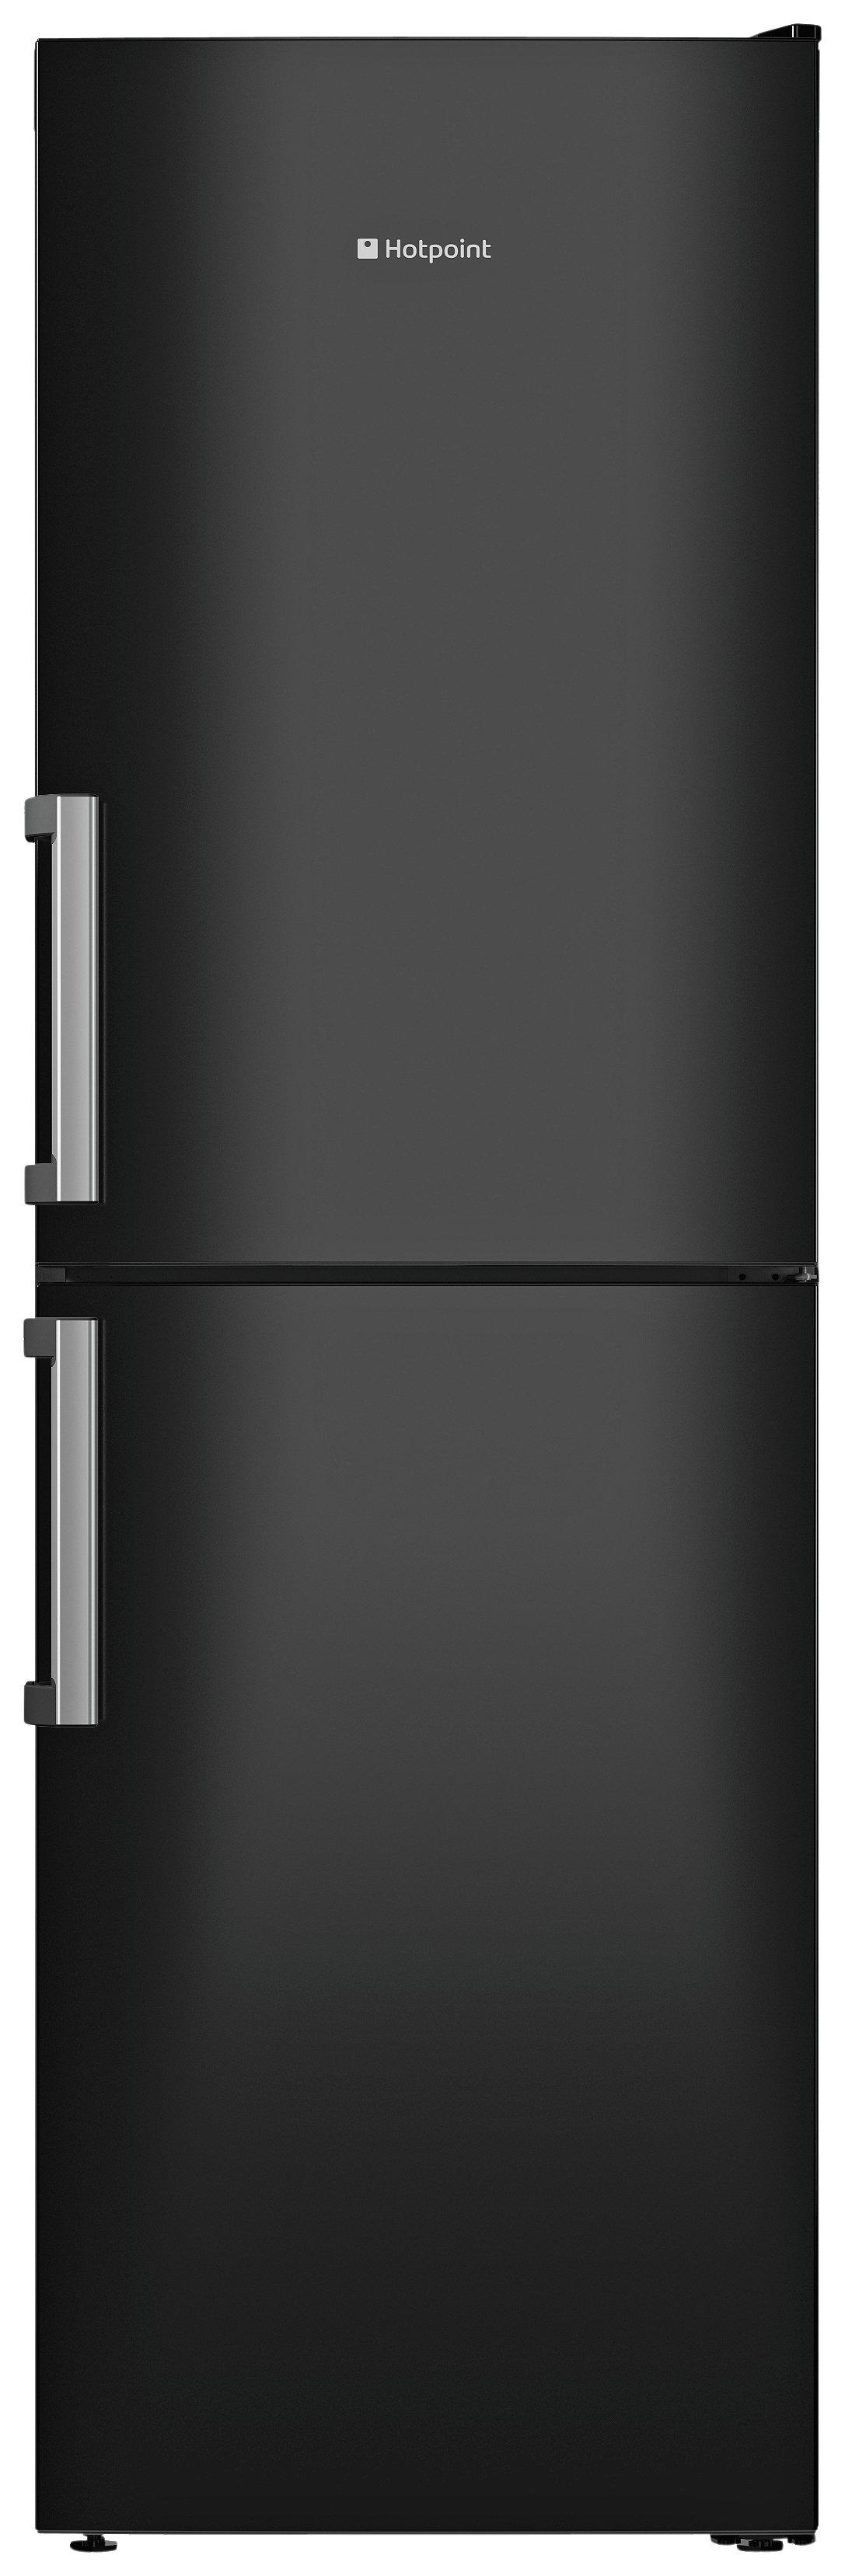 Hotpoint LAG85N1IKH Frost Free Fridge Freezer - Black.